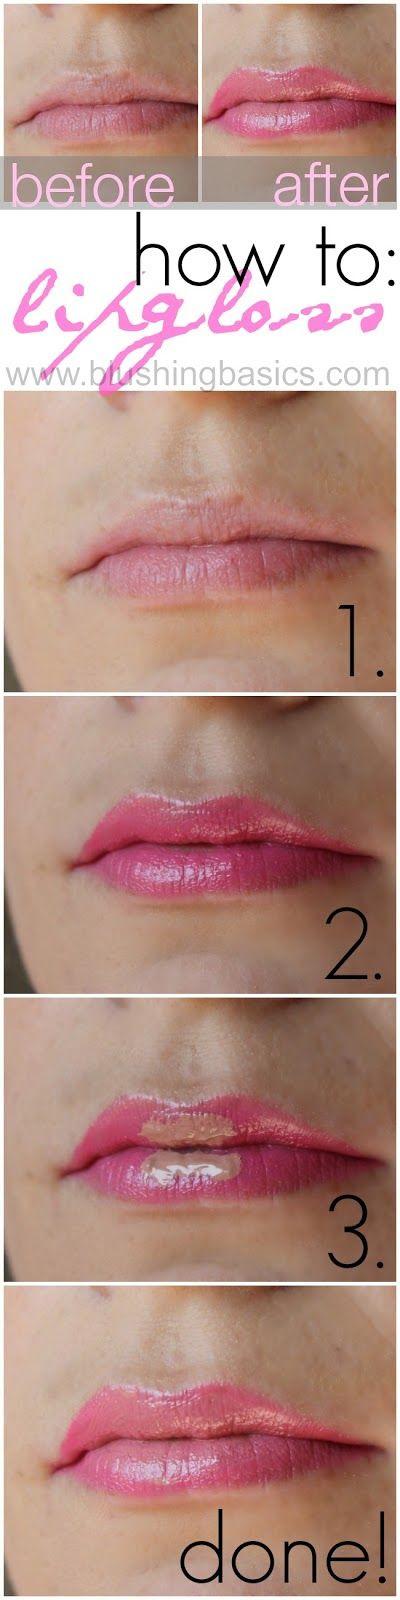 #blushingbasics // how to apply lipgloss  #beautyinspiration #sofabcon14